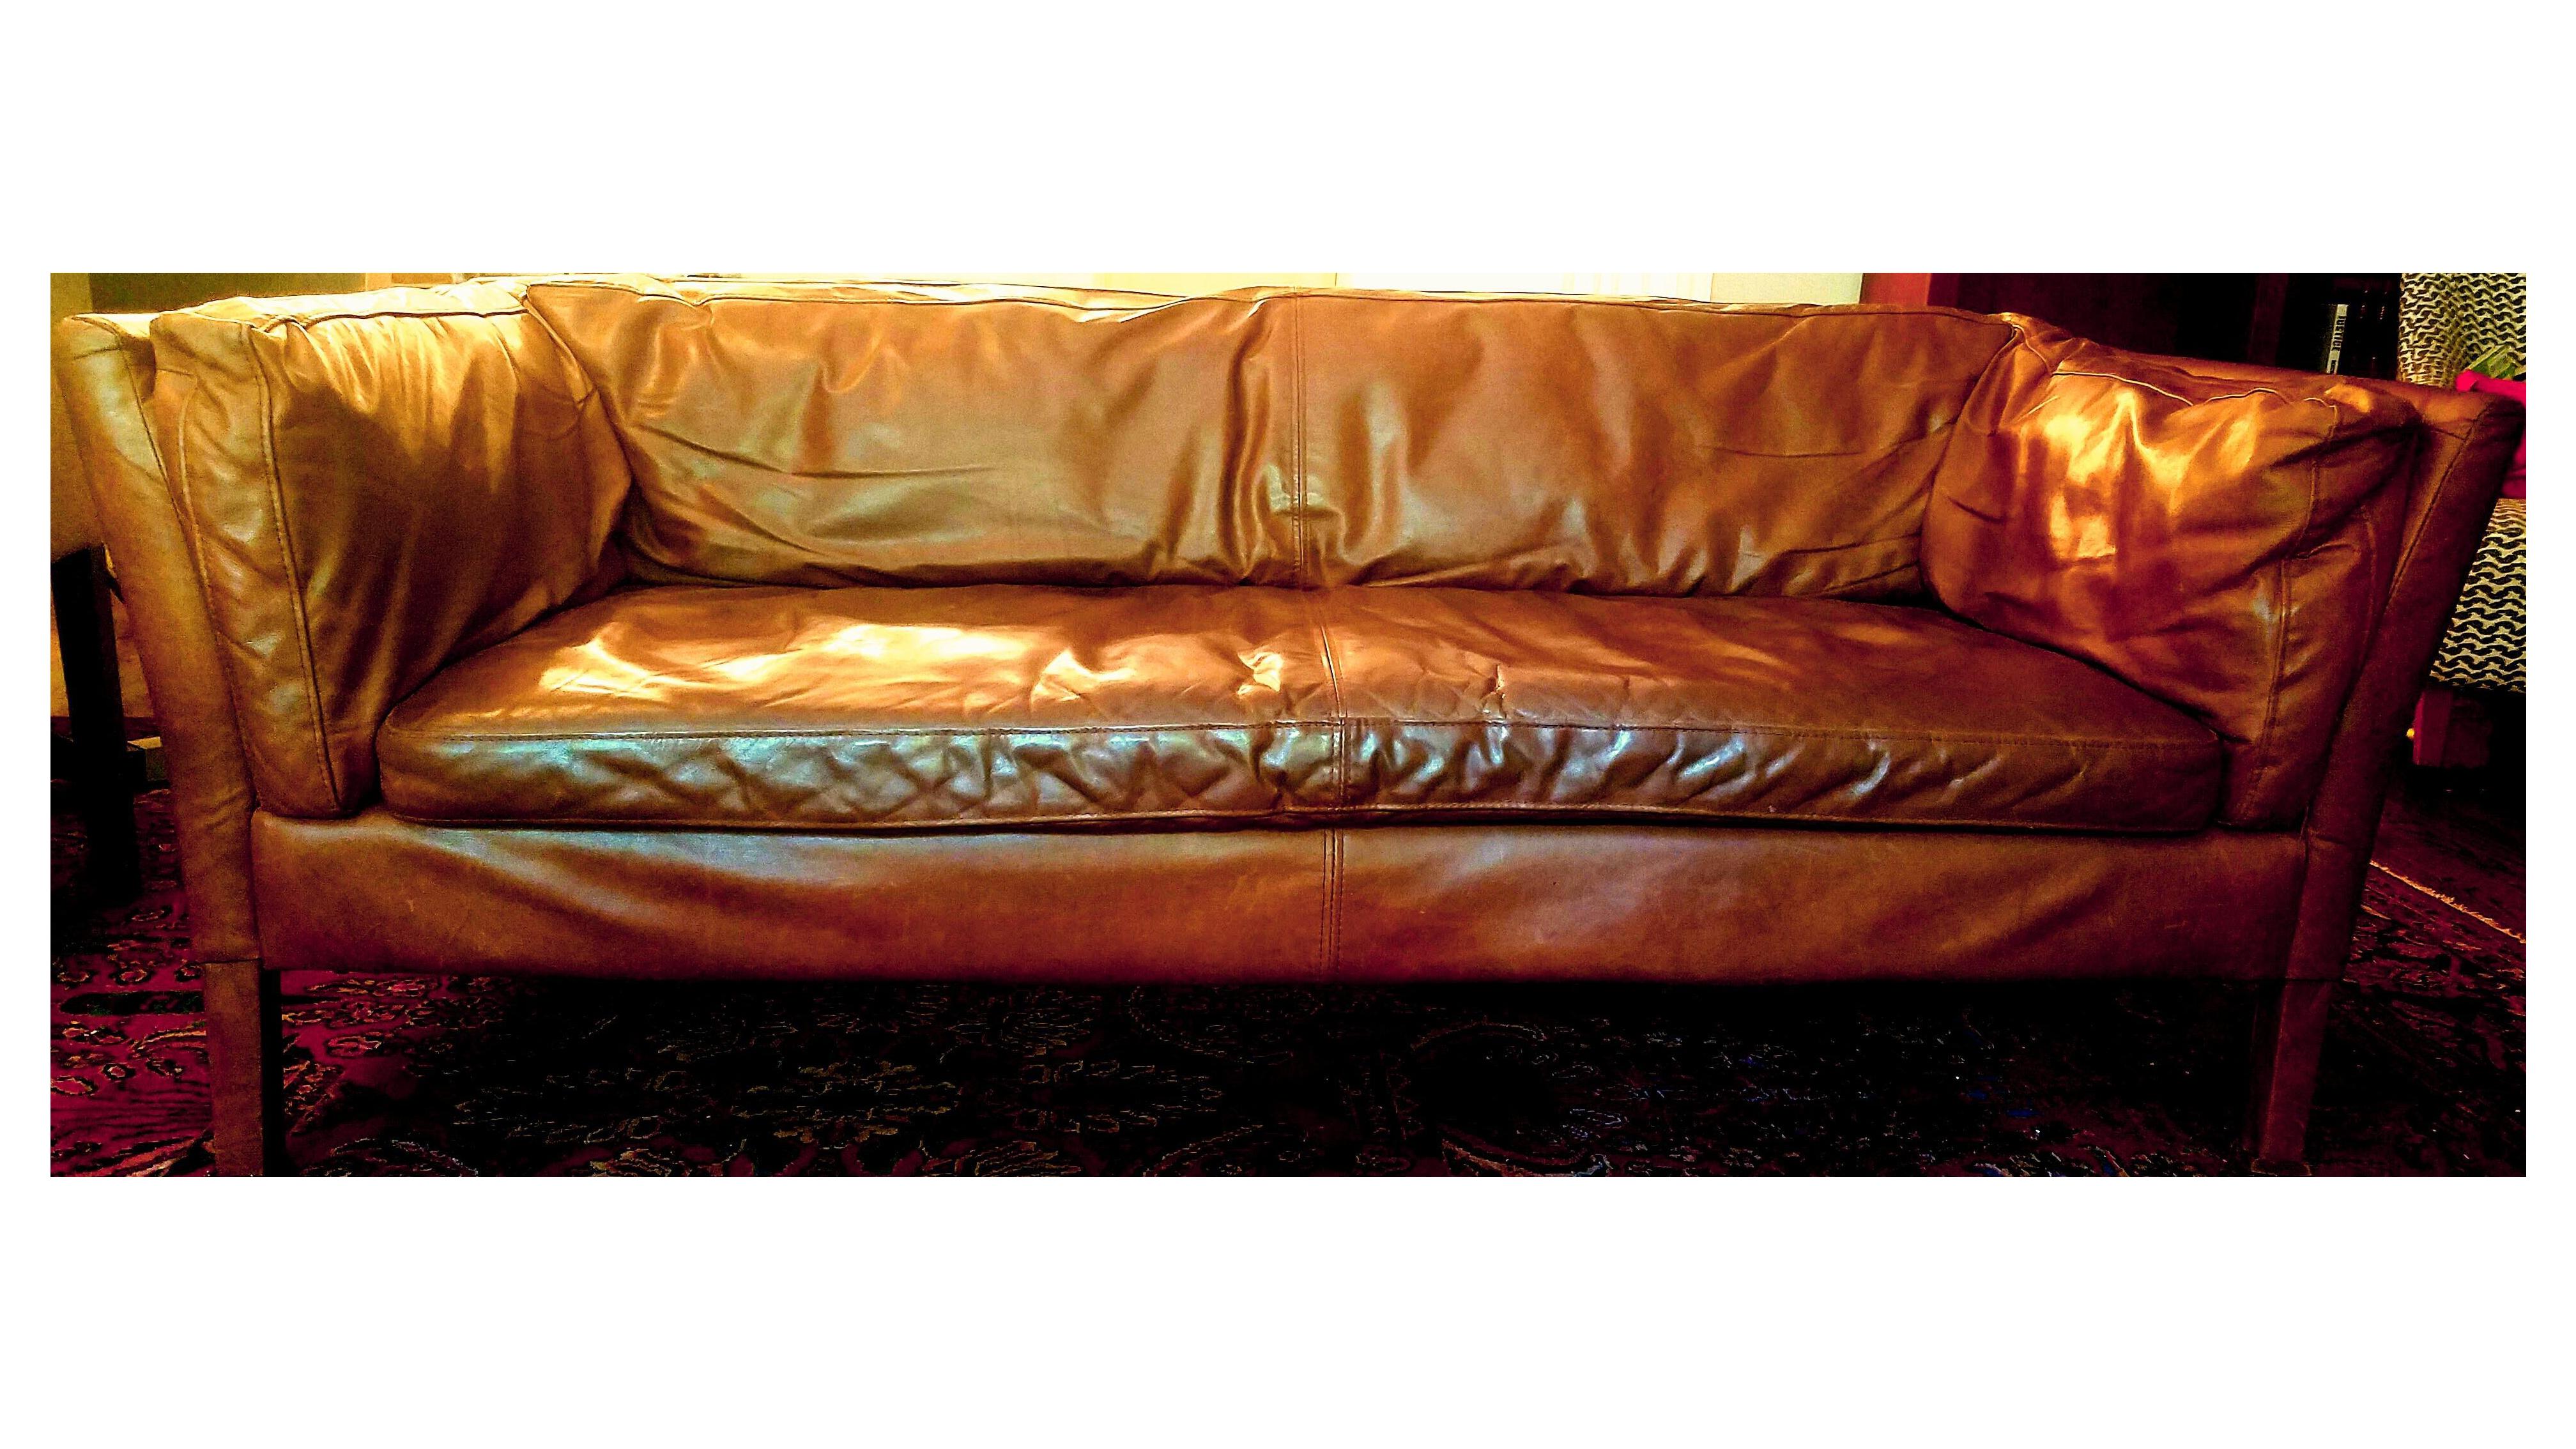 Sorensen Leather Sofa from Restoration Hardware